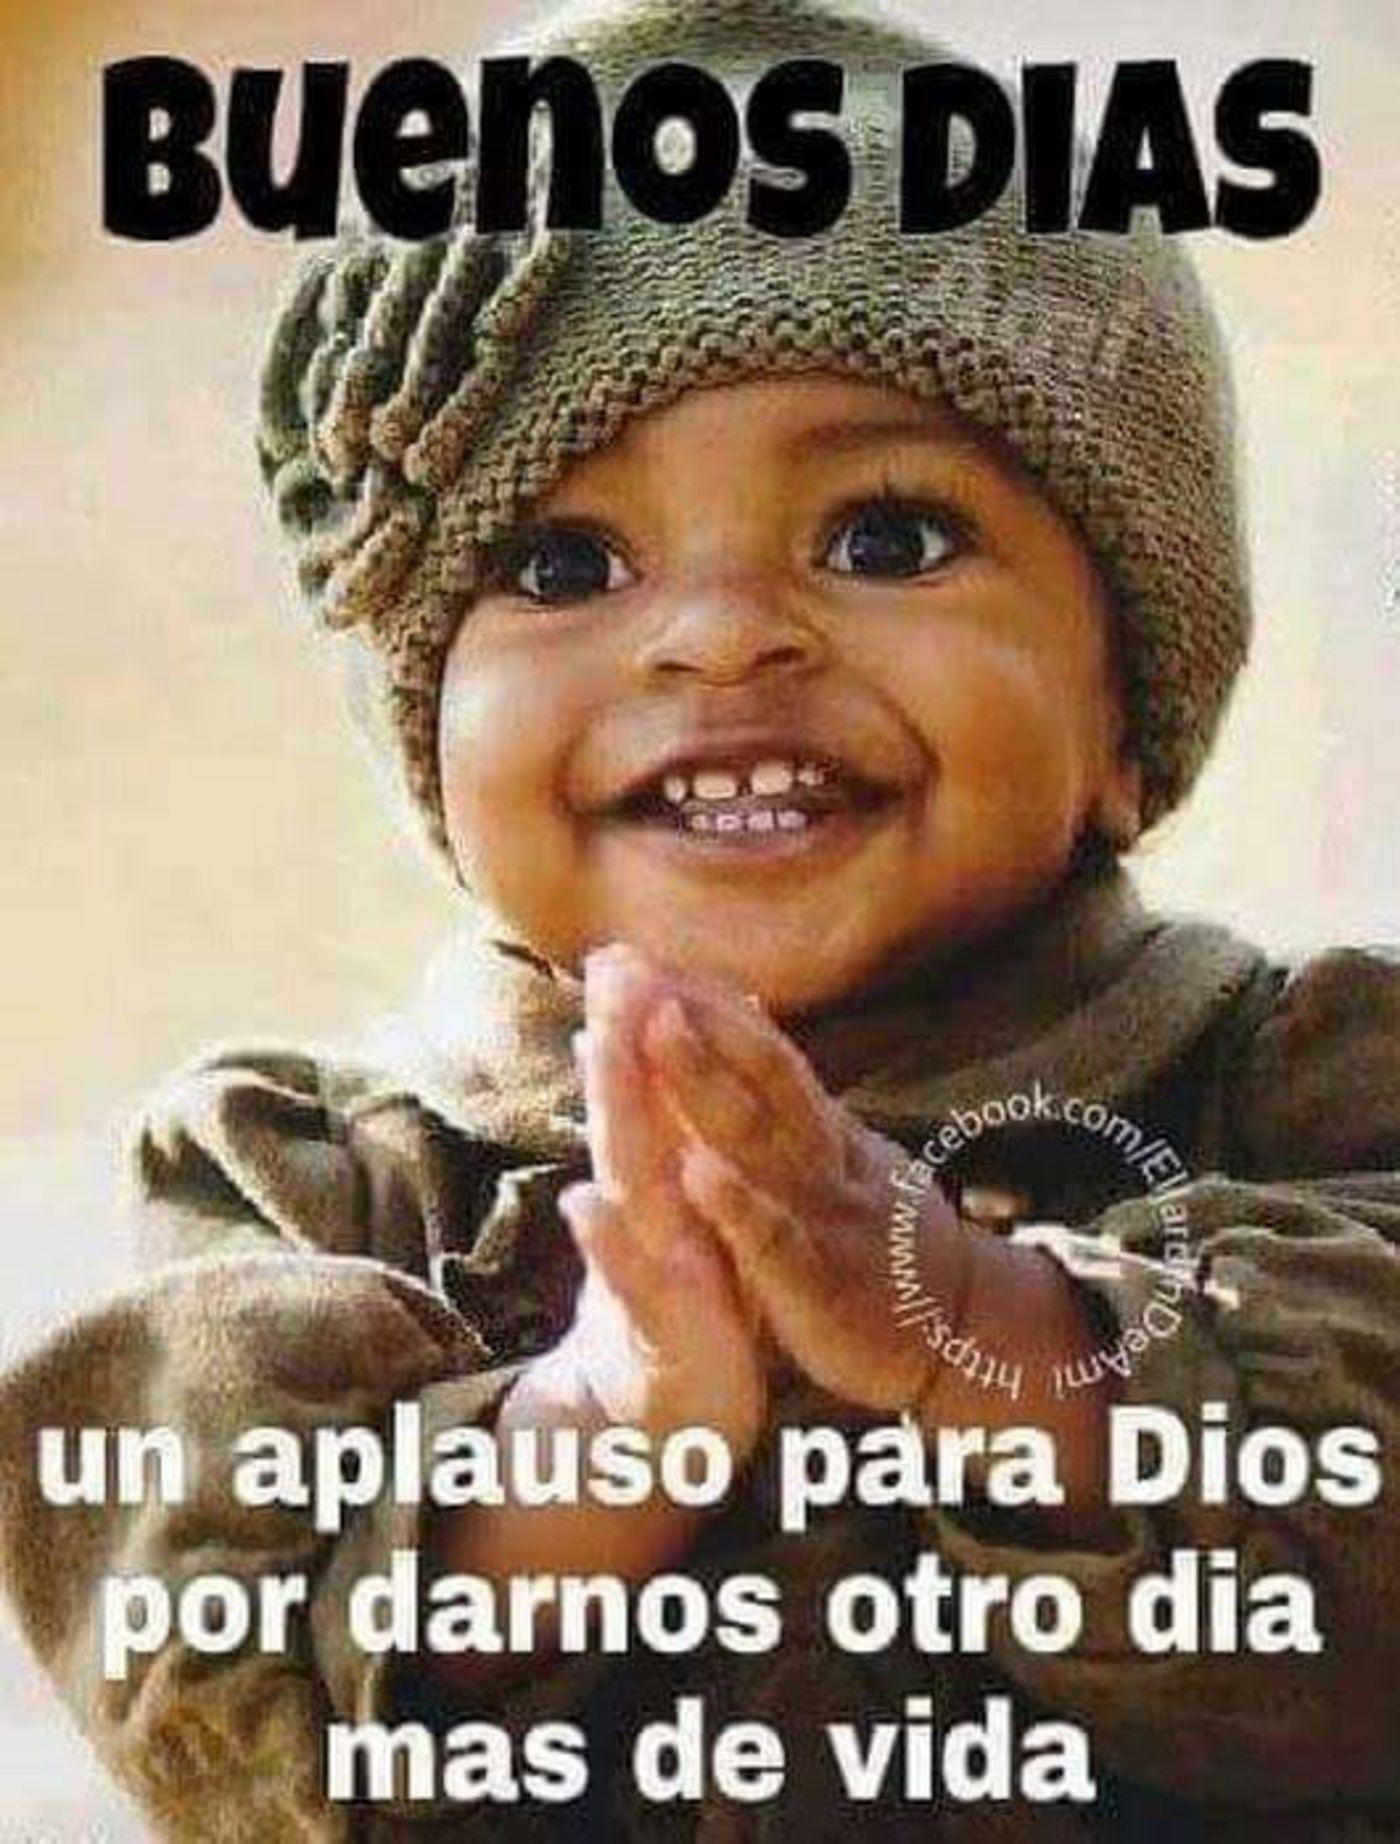 buenos días un aplauso para Dios por darnos otro día mas de vida